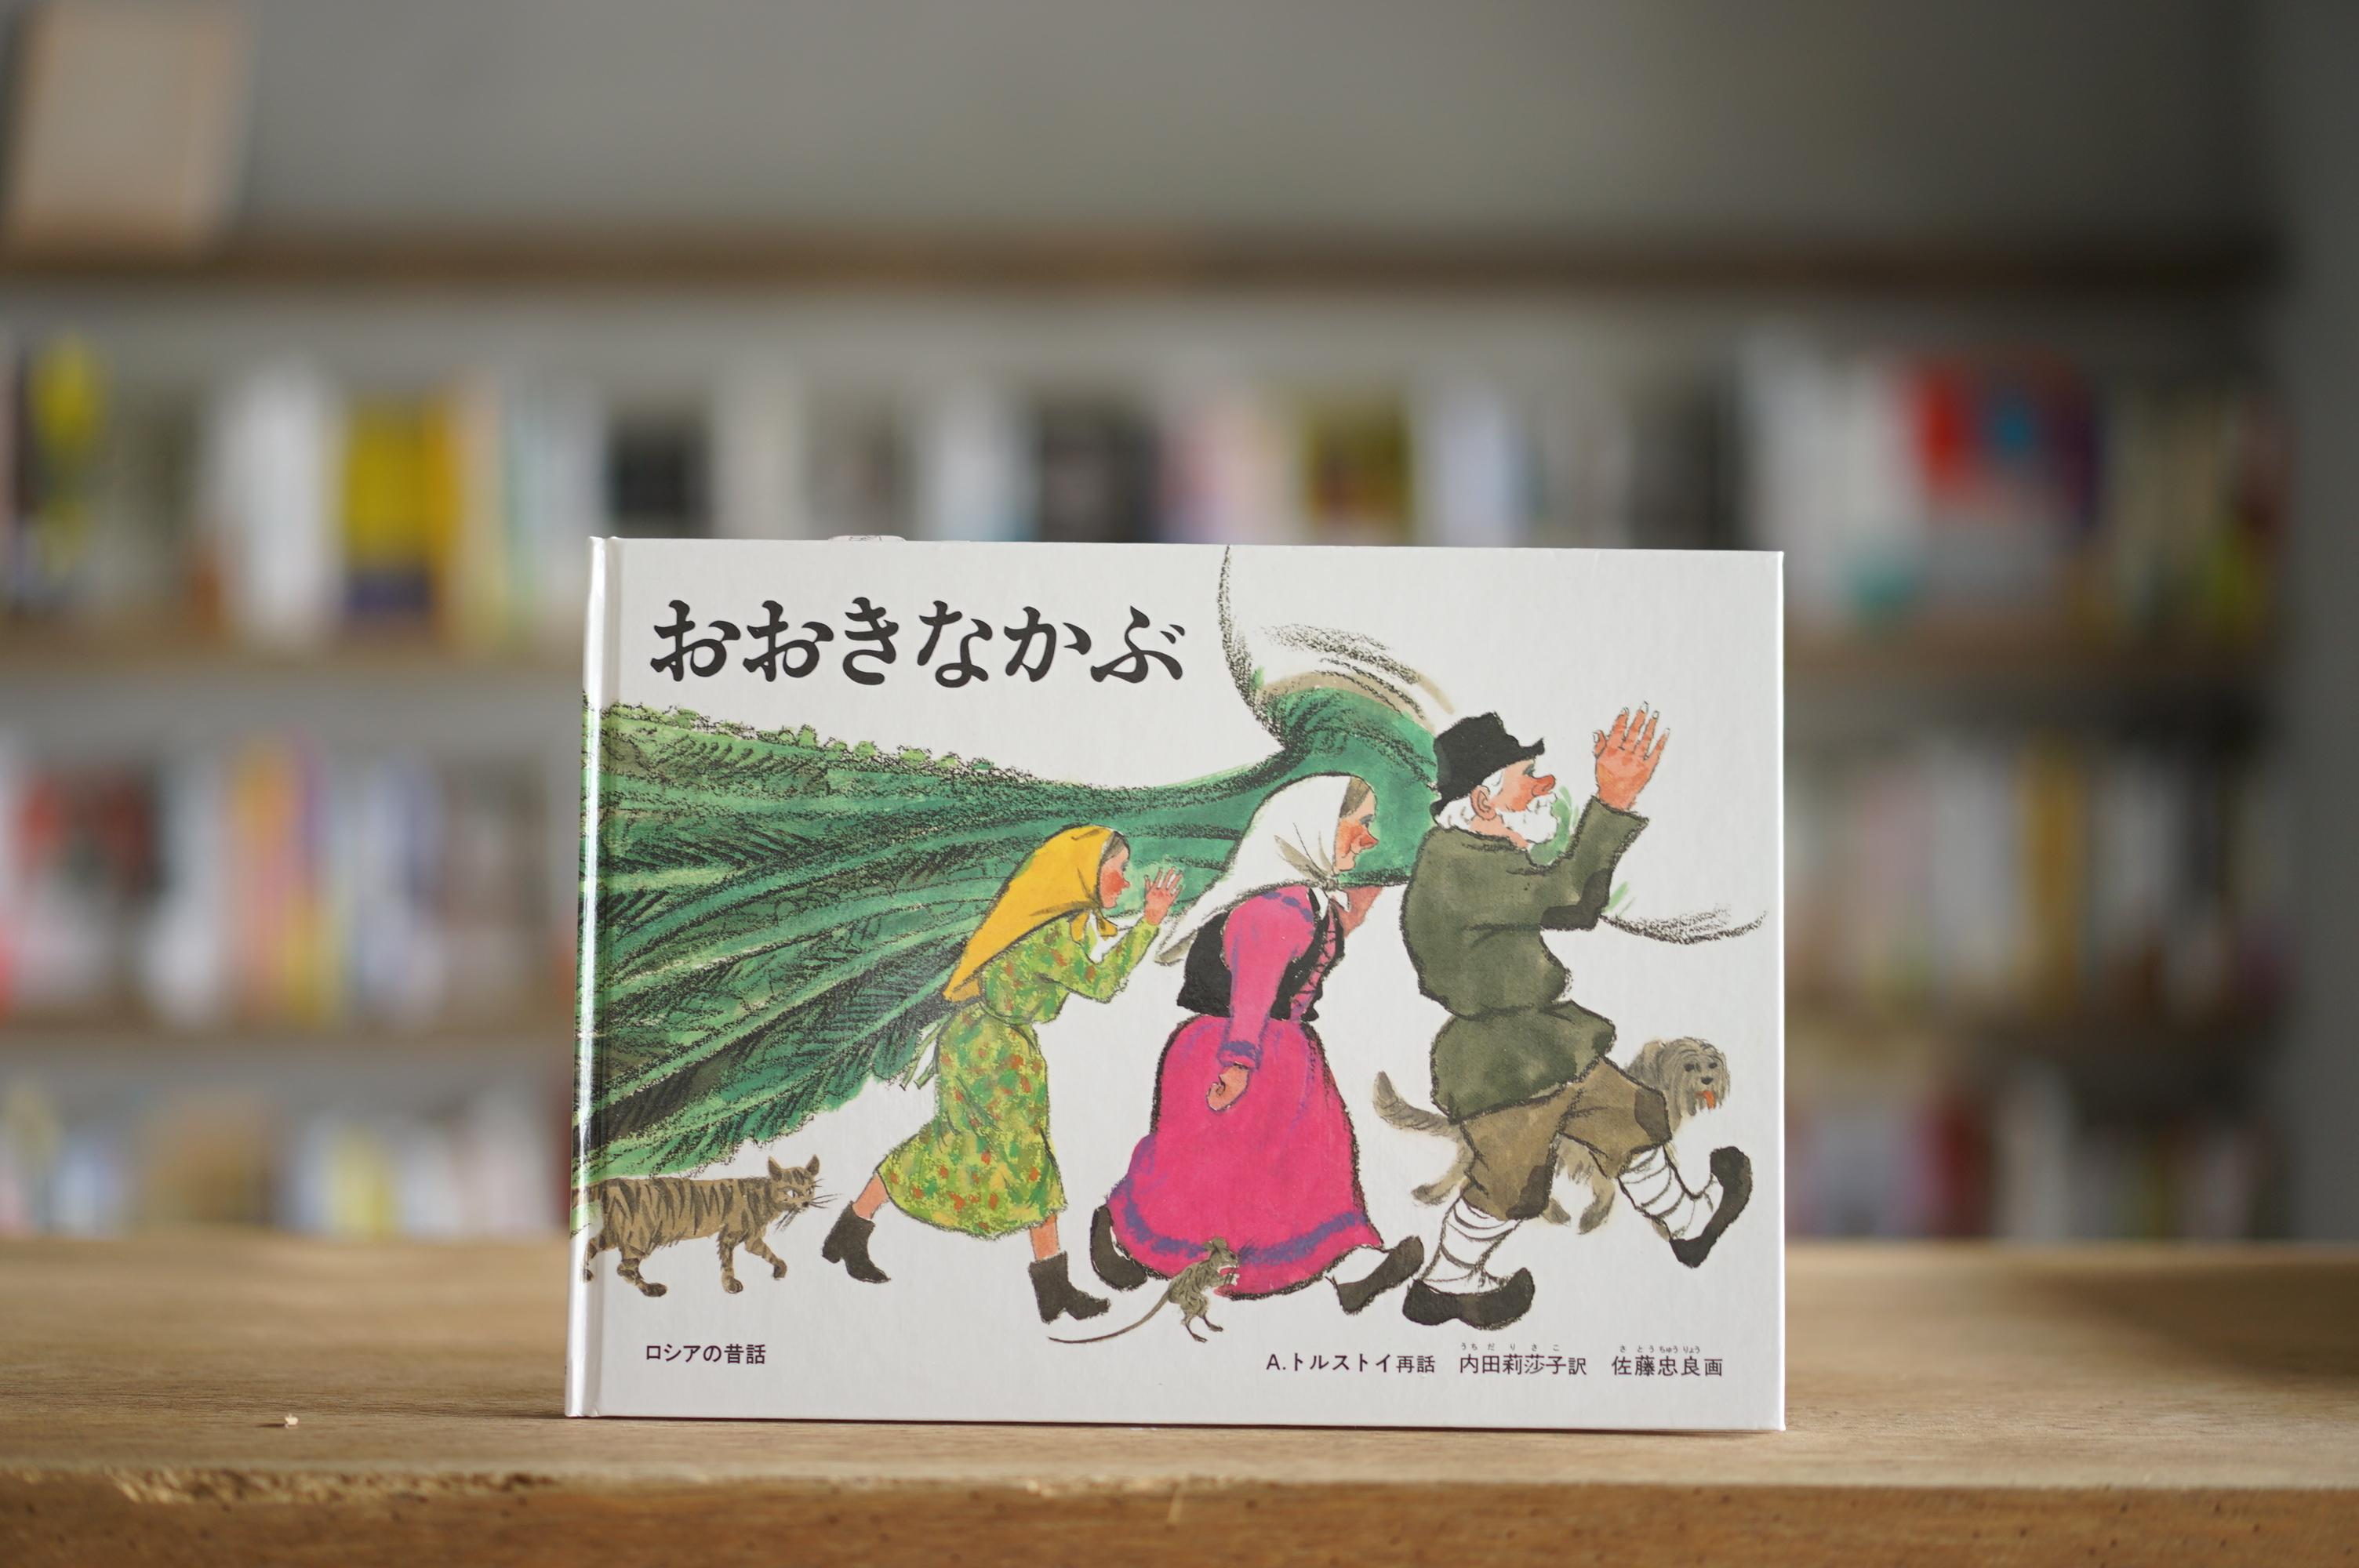 A・トルストイ 訳:内田莉莎子、絵:佐藤忠良 『おおきなかぶ』 (福音館書店、1966)